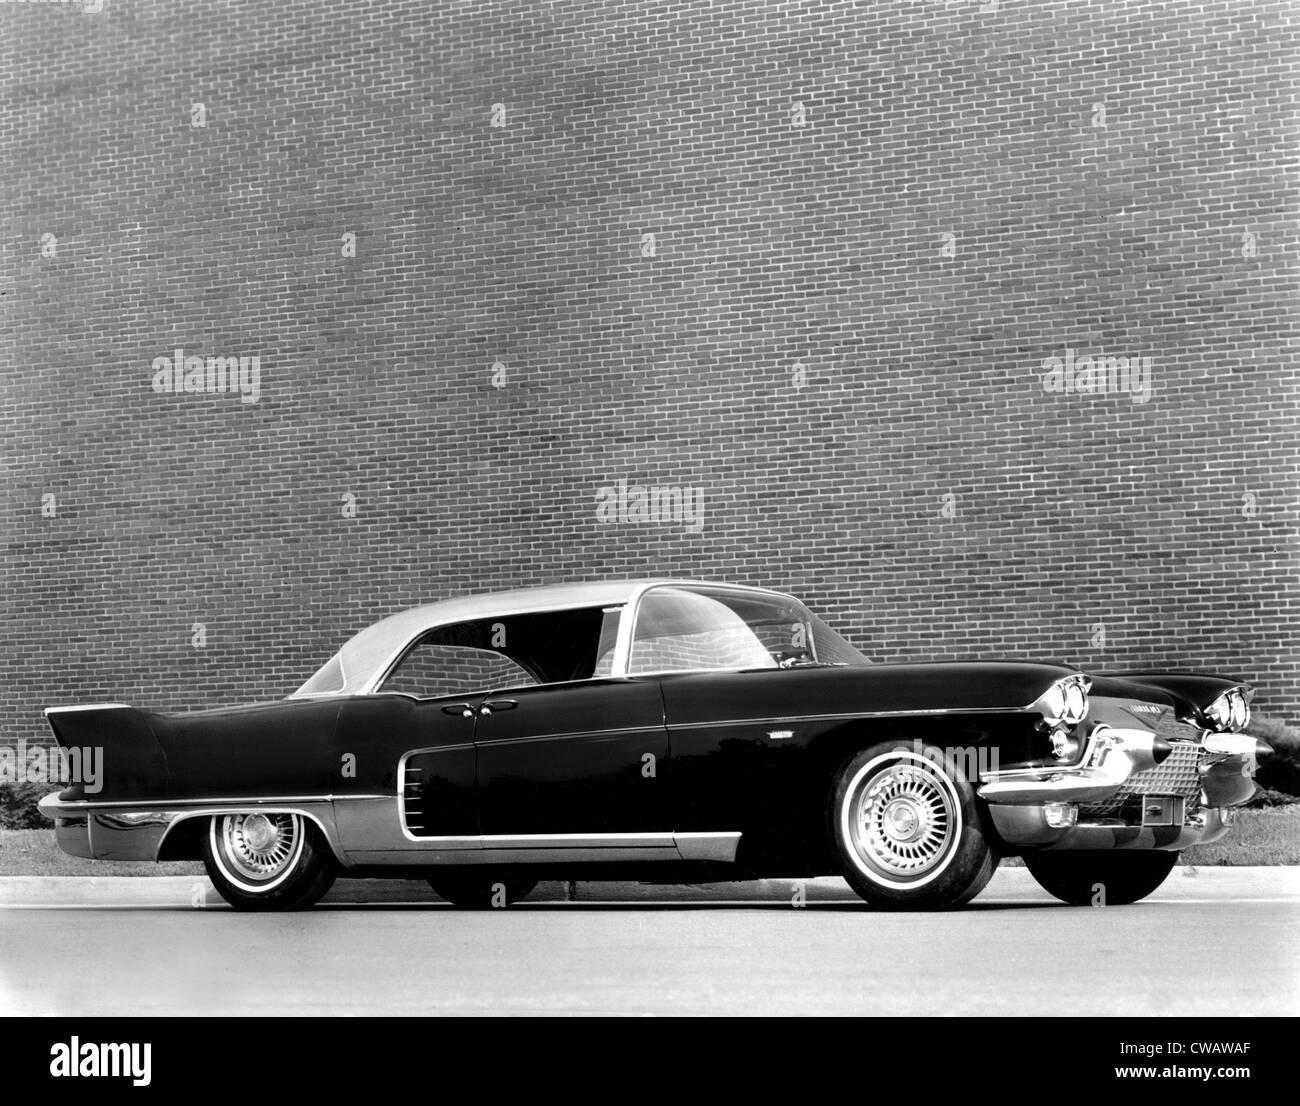 Cadillac Eldorado Brougham 1957 Courtesy Csu Archives Everett